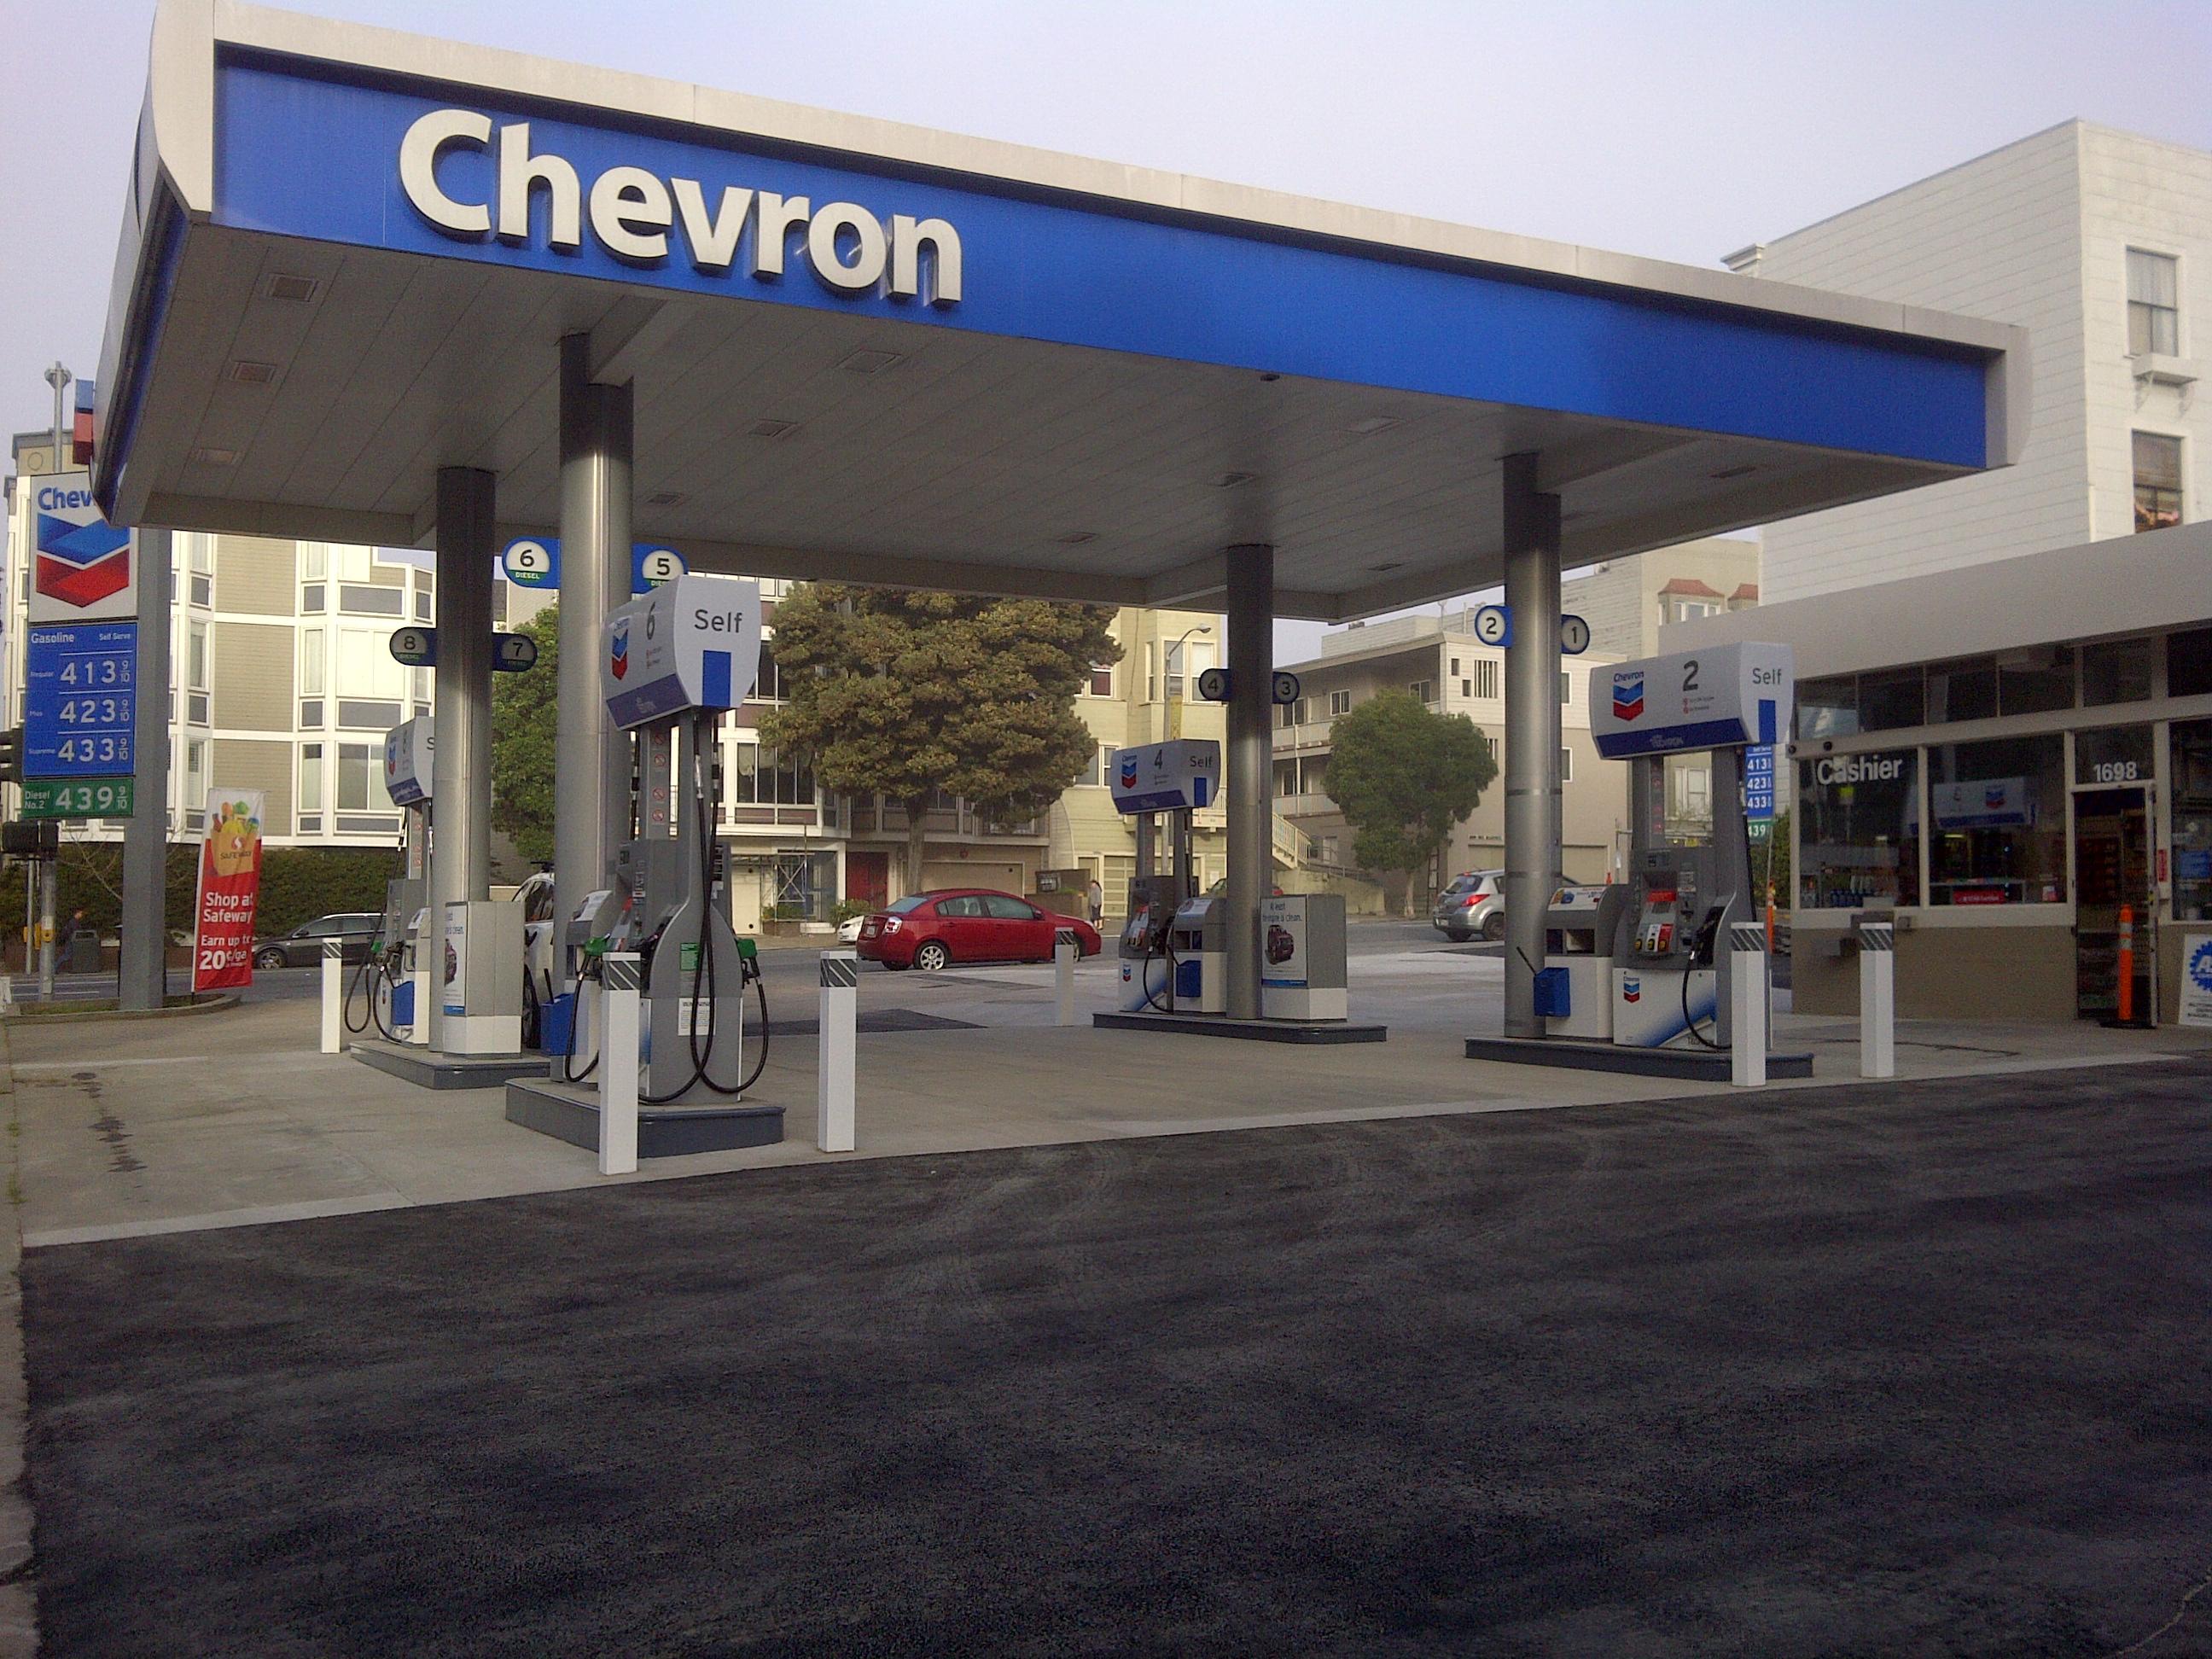 Chevron At Masonic & Fell 1698 Fell St, San Francisco, CA 94117 - YP.com